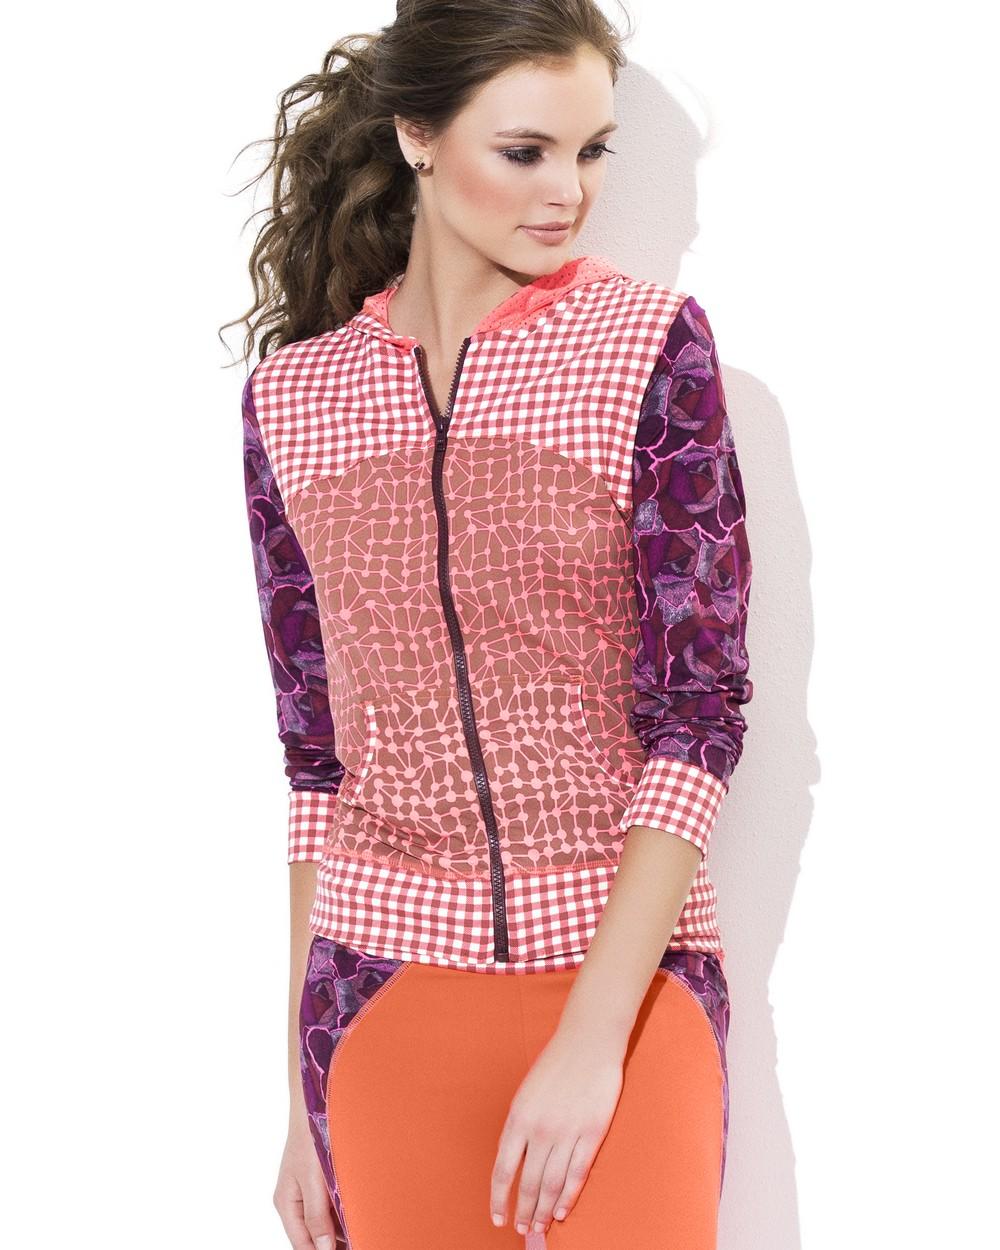 2015 Maaji Studio Activewear Spring Peachy Pink Jacket